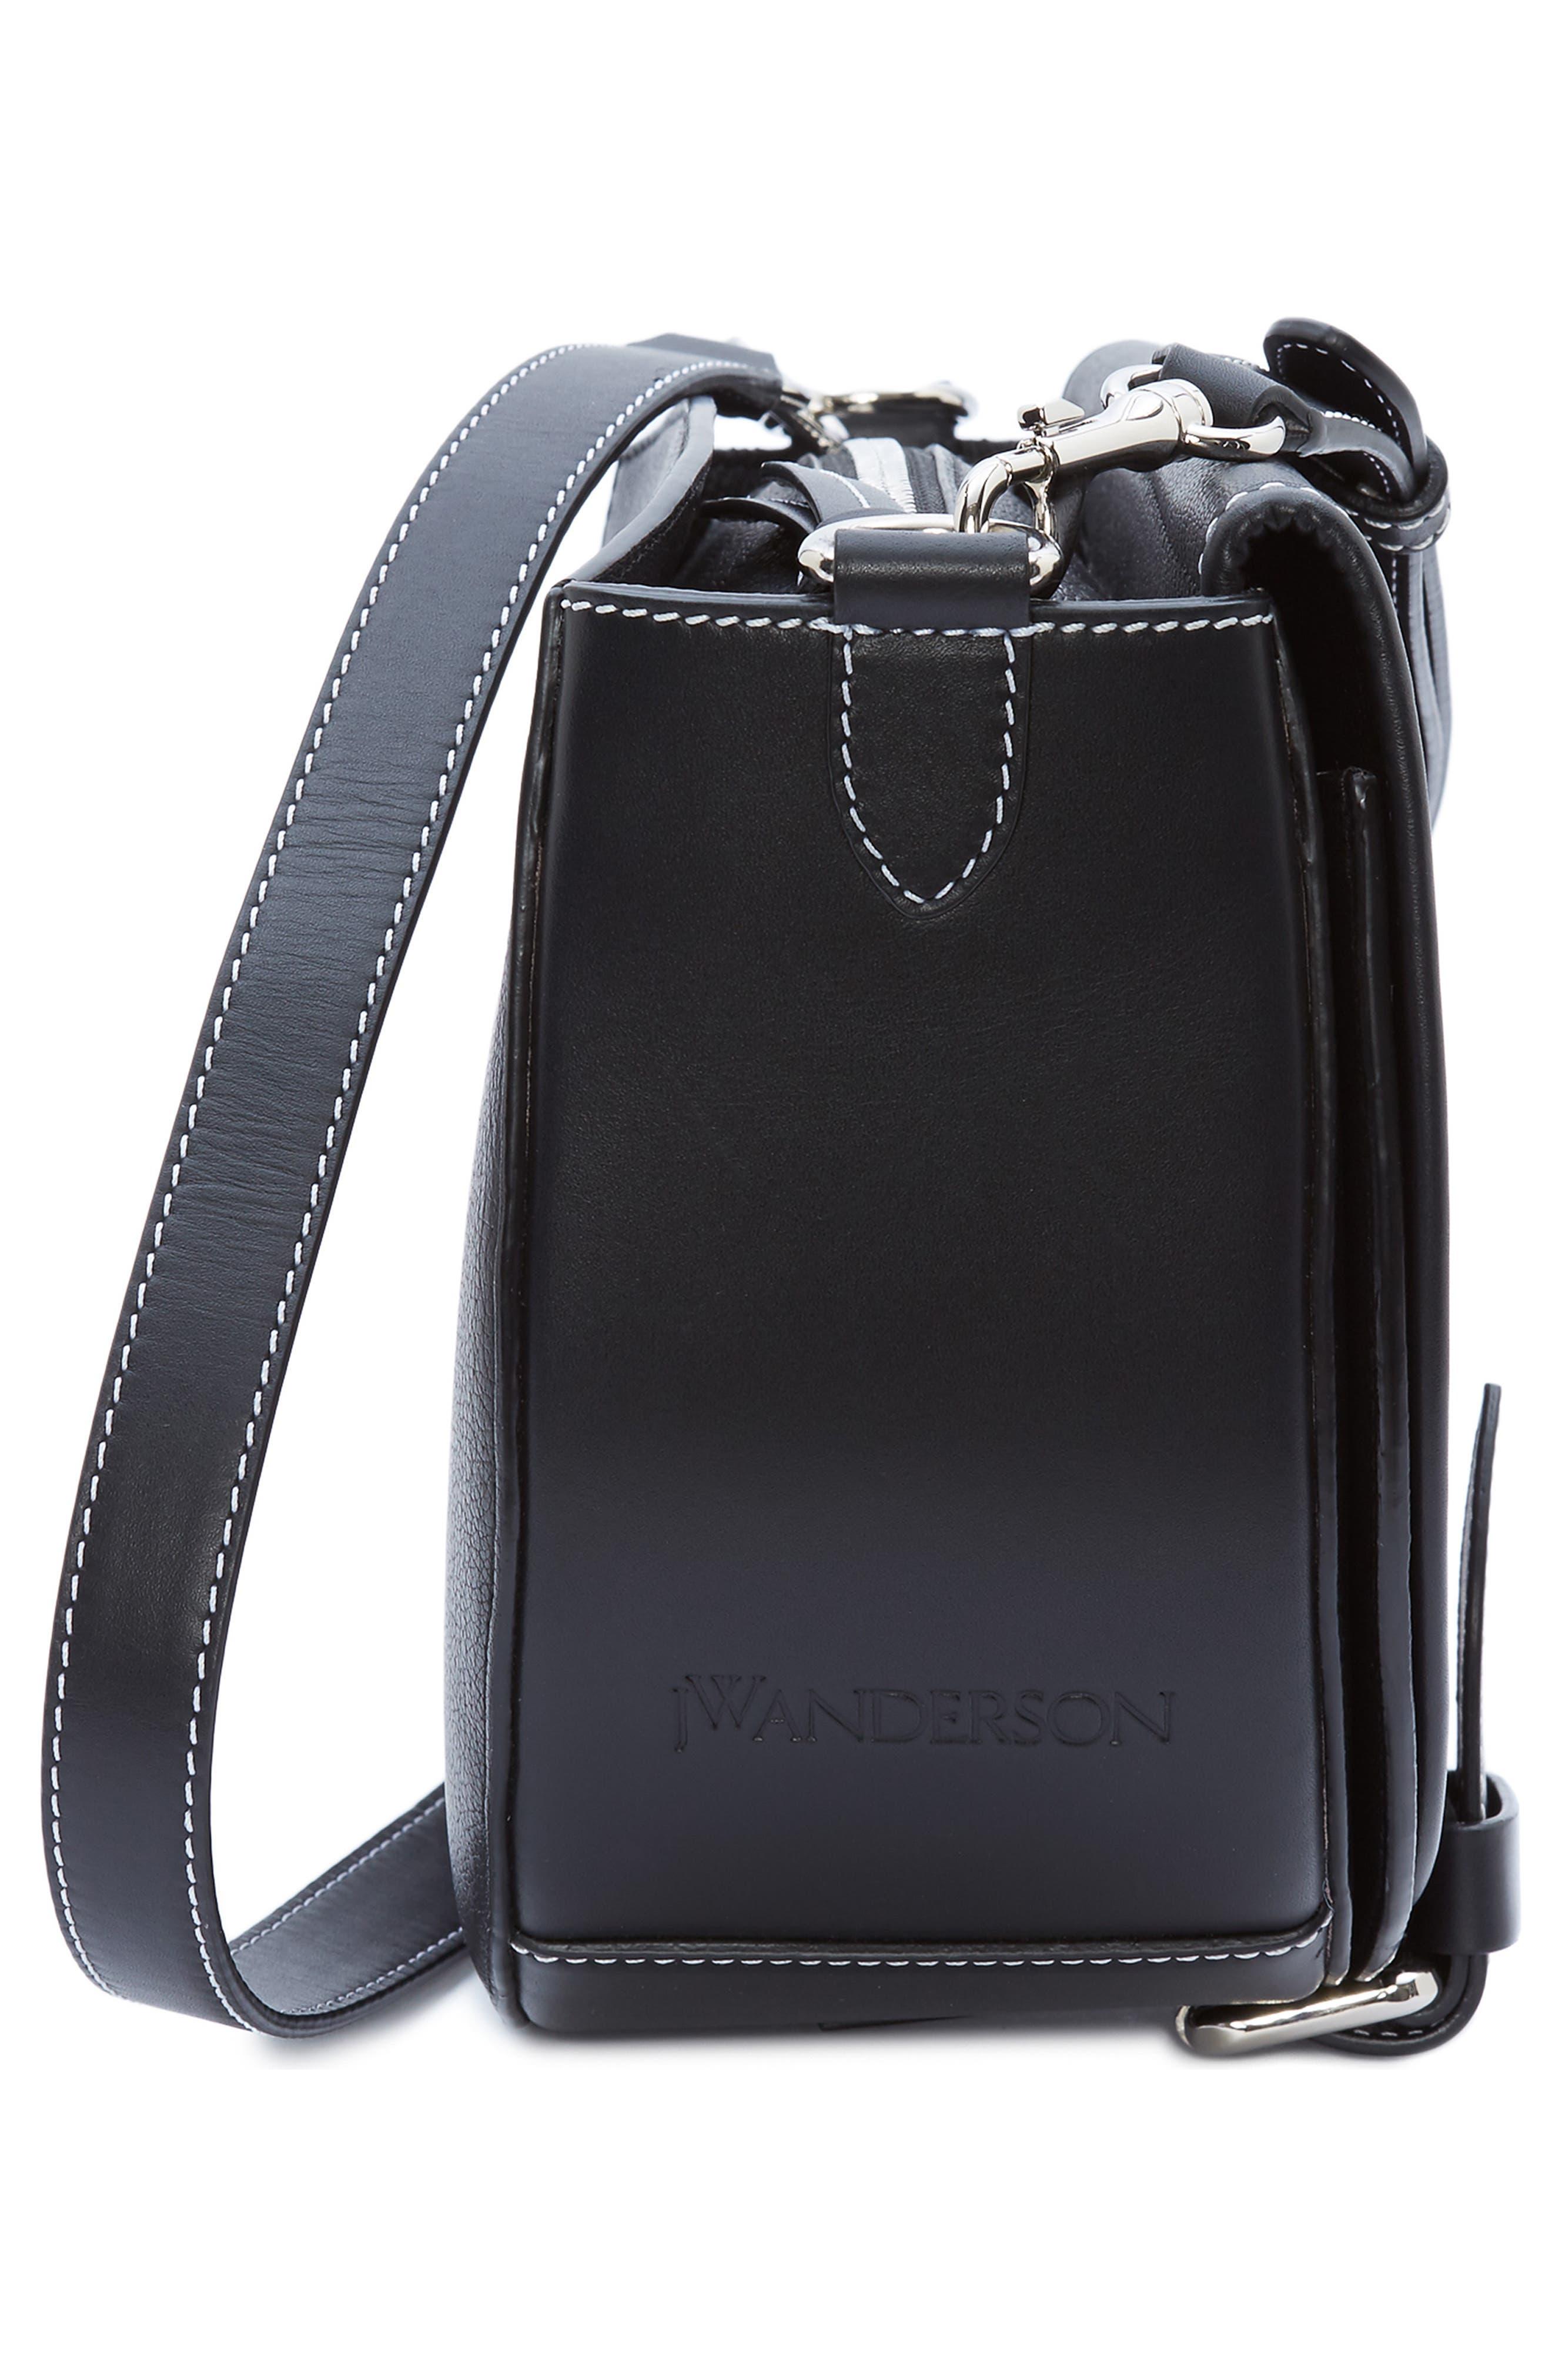 JW ANDERSON,                             Small Bike Leather Crossbody Bag,                             Alternate thumbnail 4, color,                             BLACK